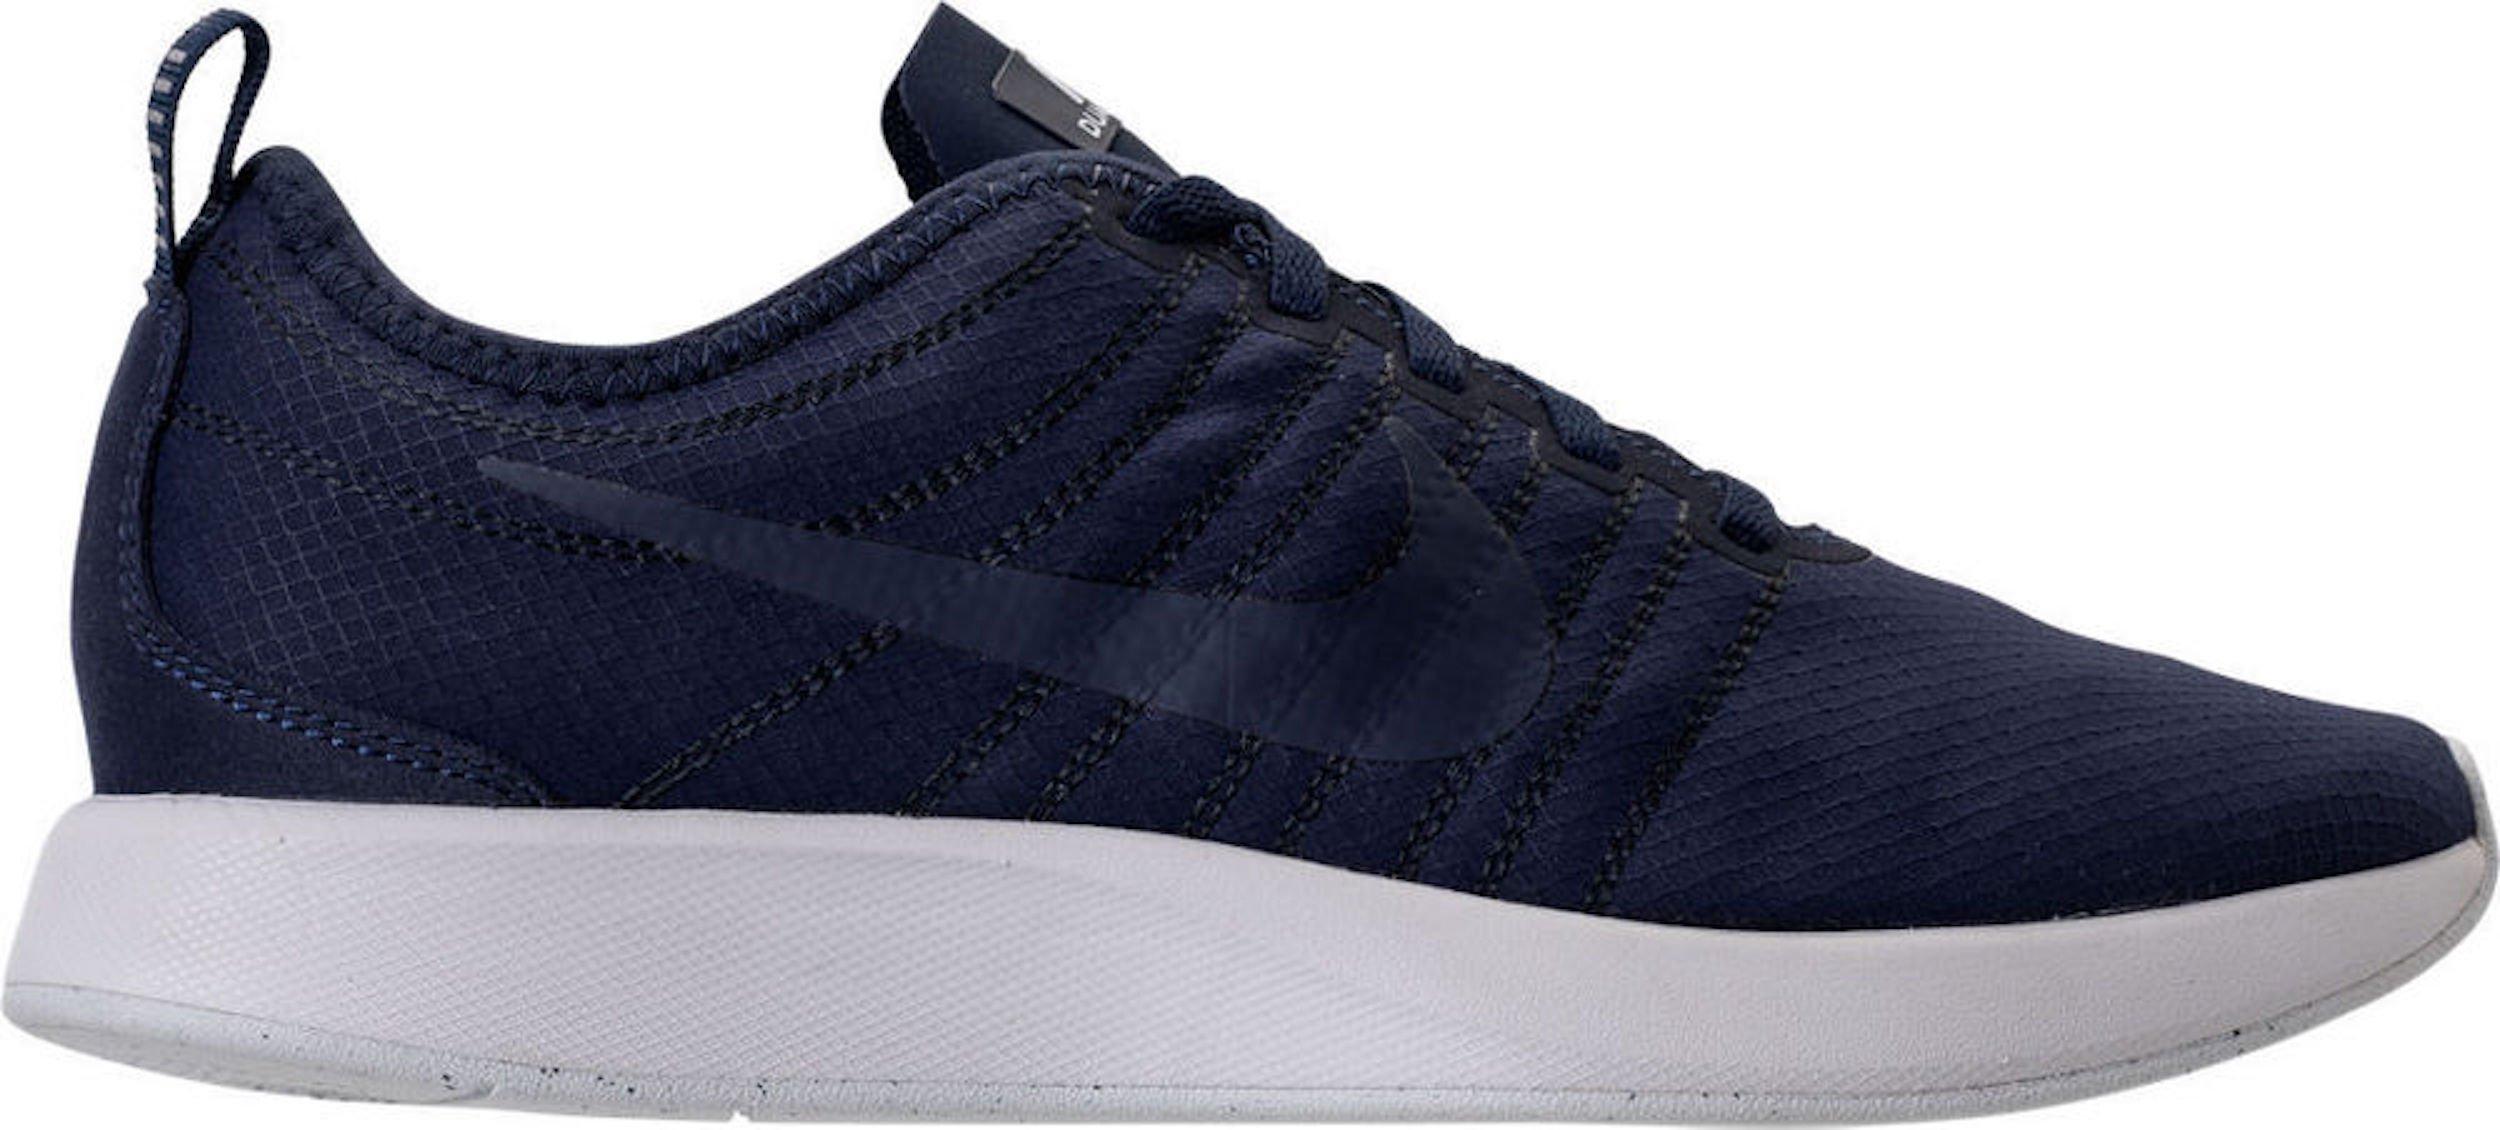 huge discount 2007a 4f5cc Galleon - Nike Men s Dualtone Racer SE Navy Blue Running Shoes 922170 400  (9.5 D(M) US)